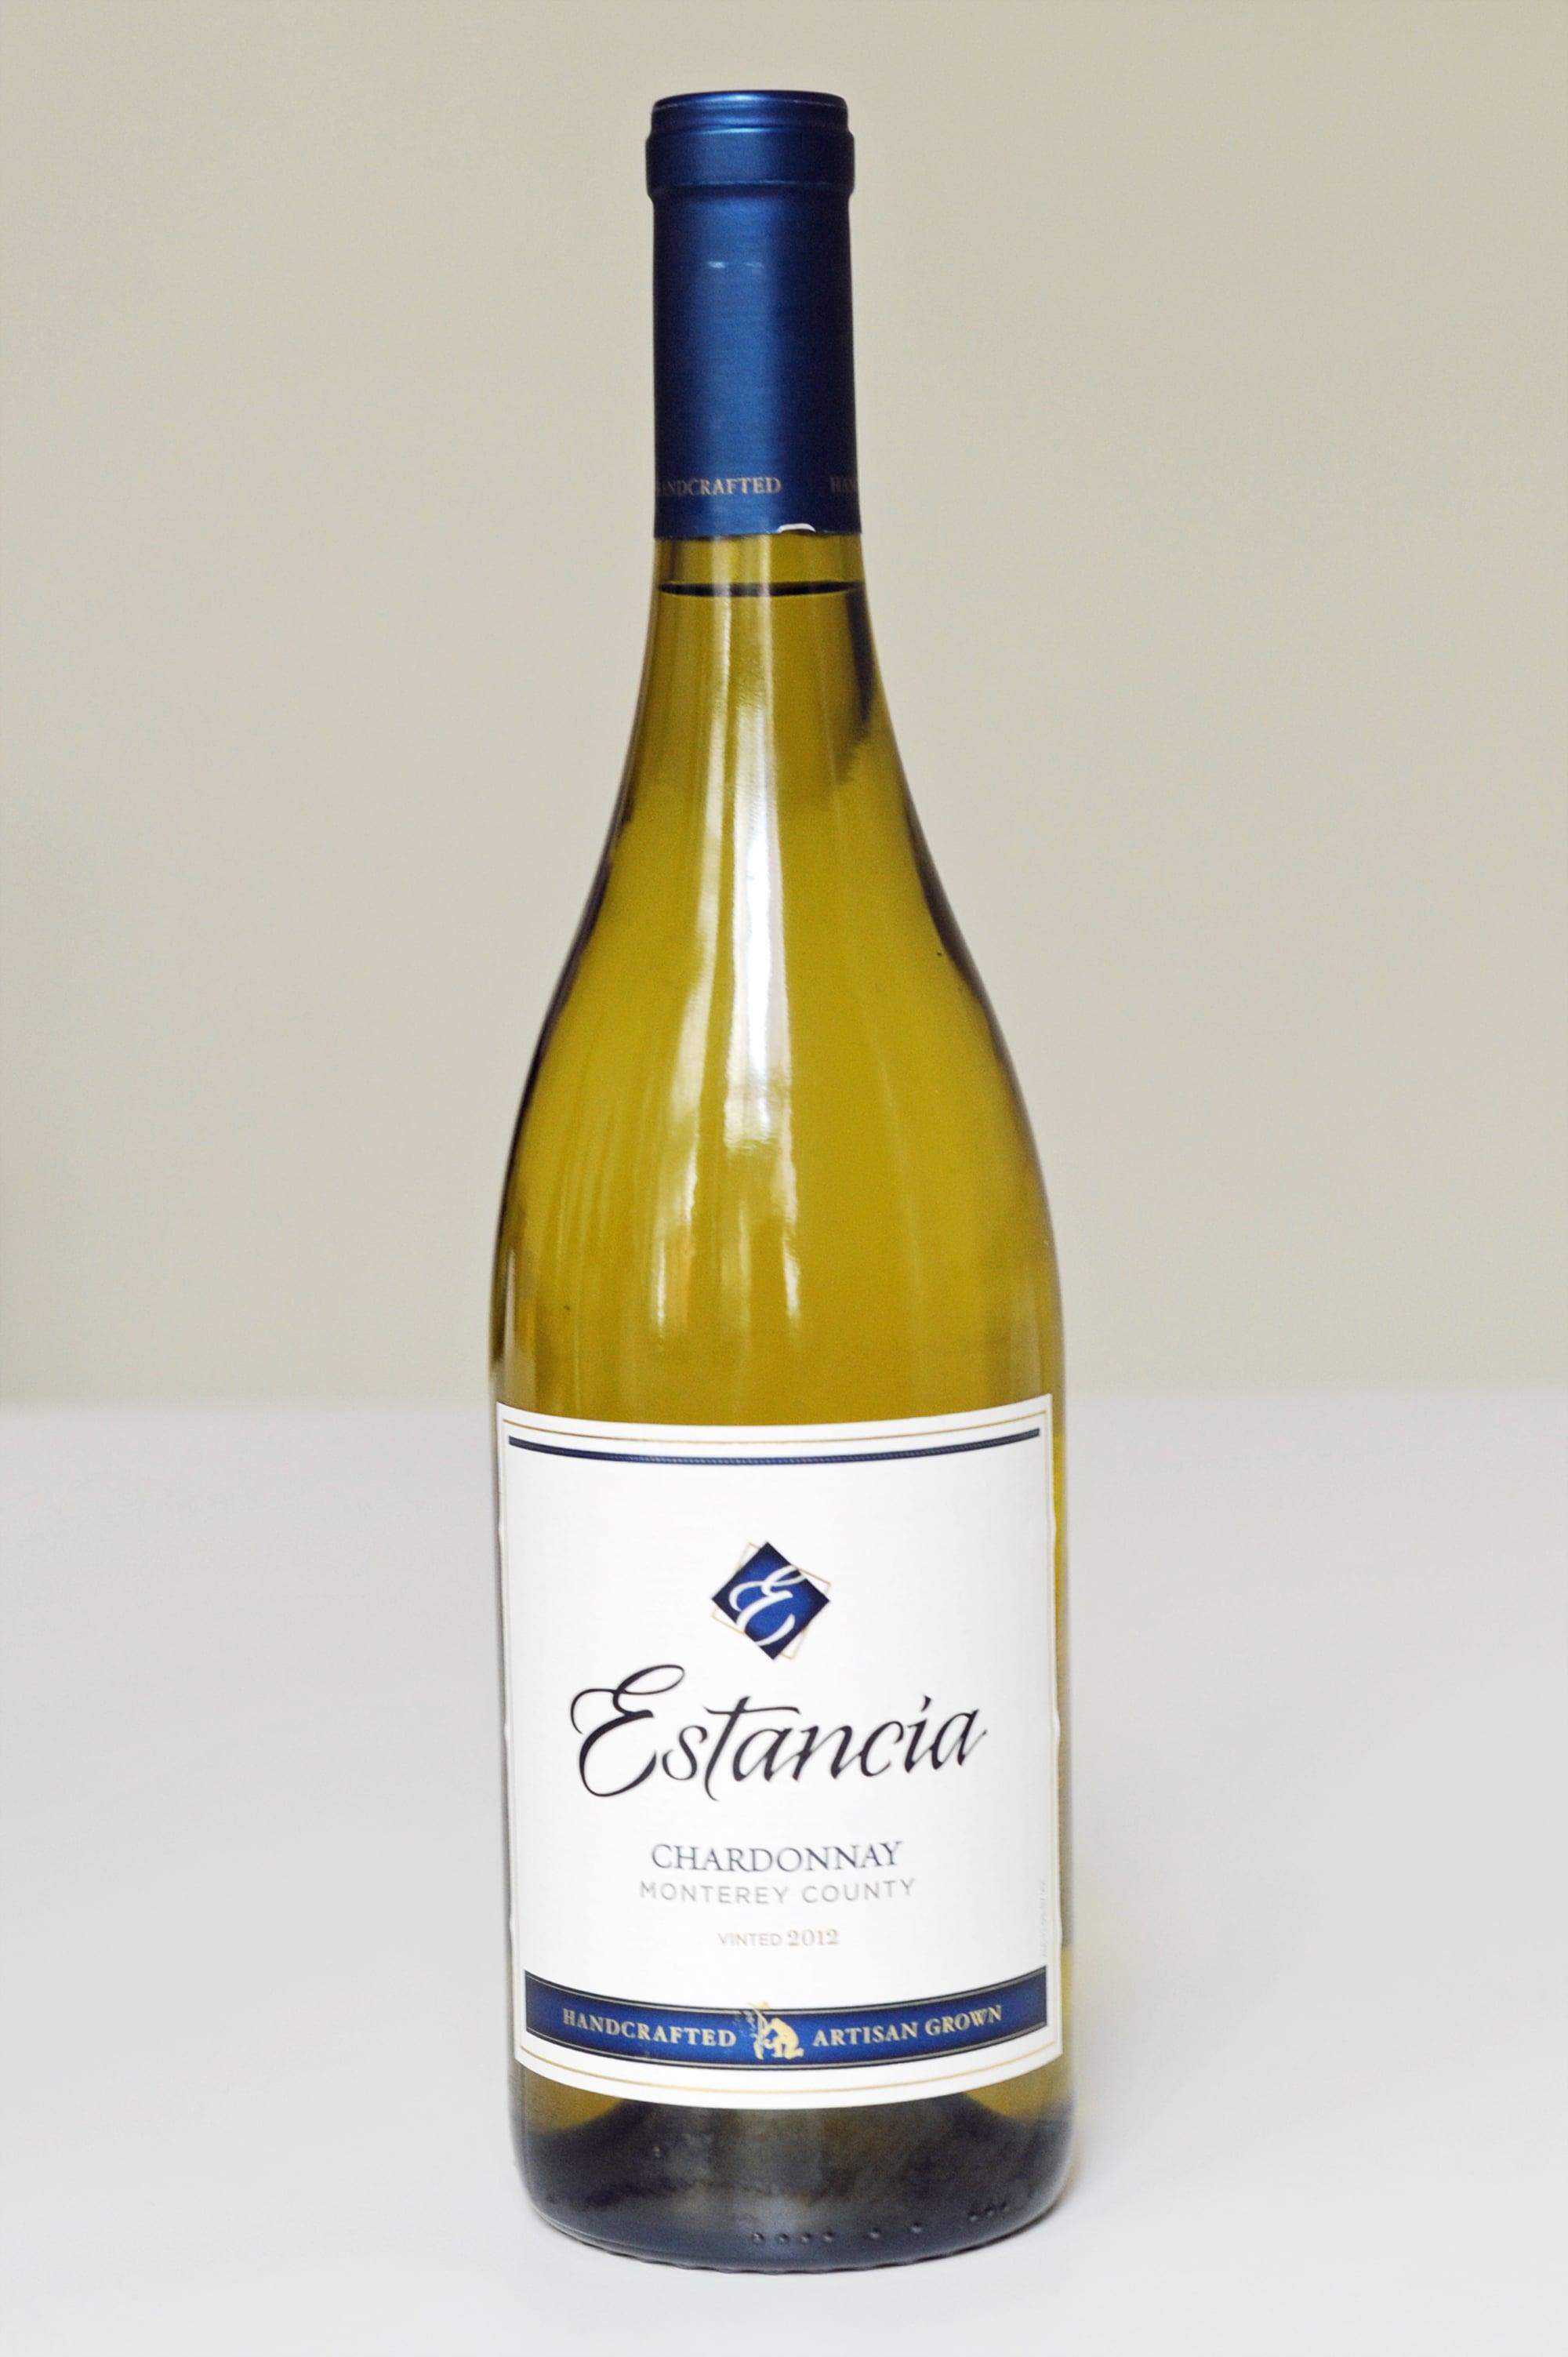 2012 Estancia Chardonnay